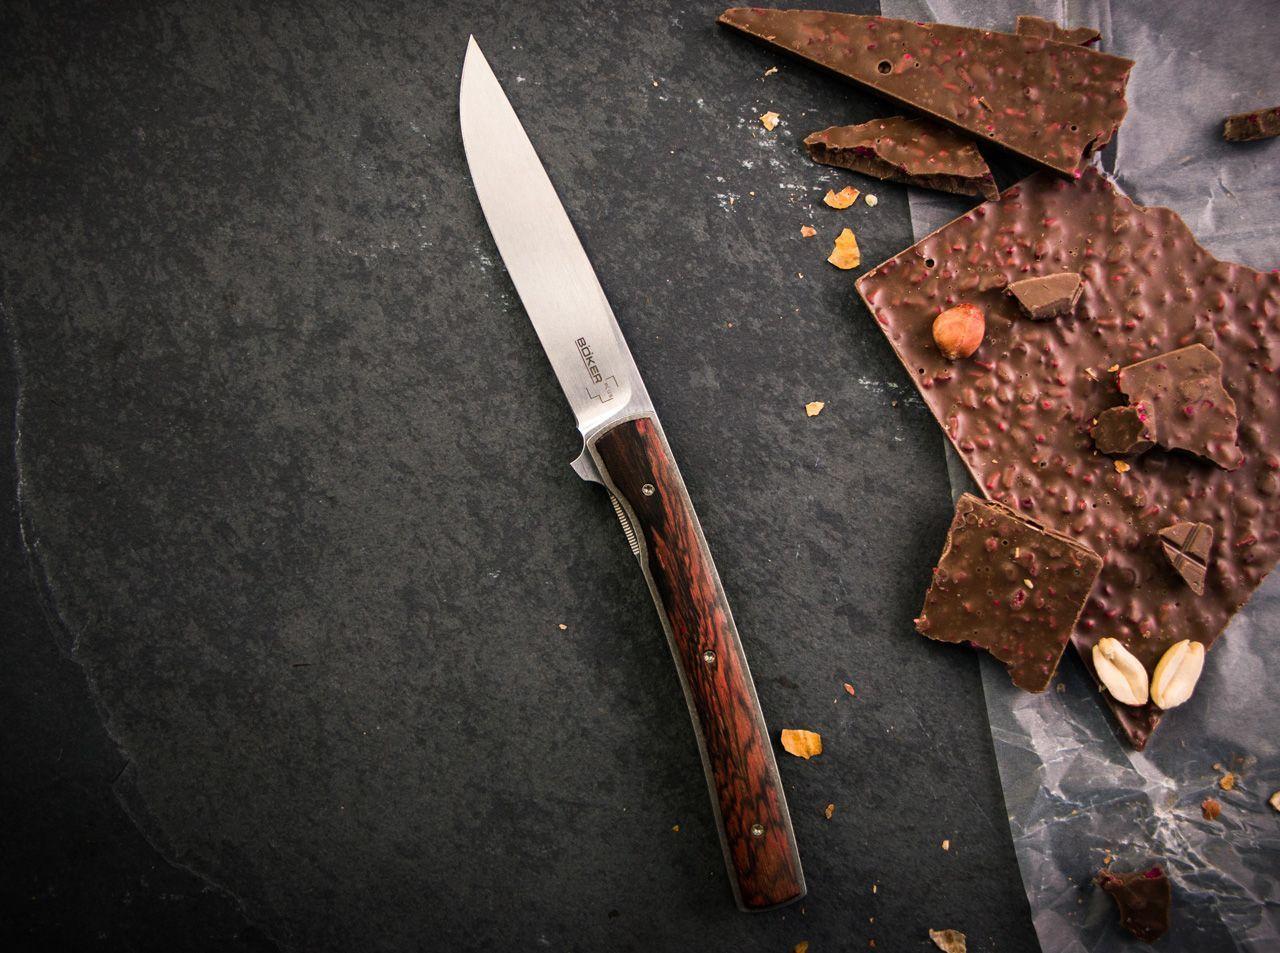 Фото 4 - Складной нож Boker Urban Trapper Gentleman Cocobolo Wood 01BO722, сталь VG-10, рукоять титан/дерево